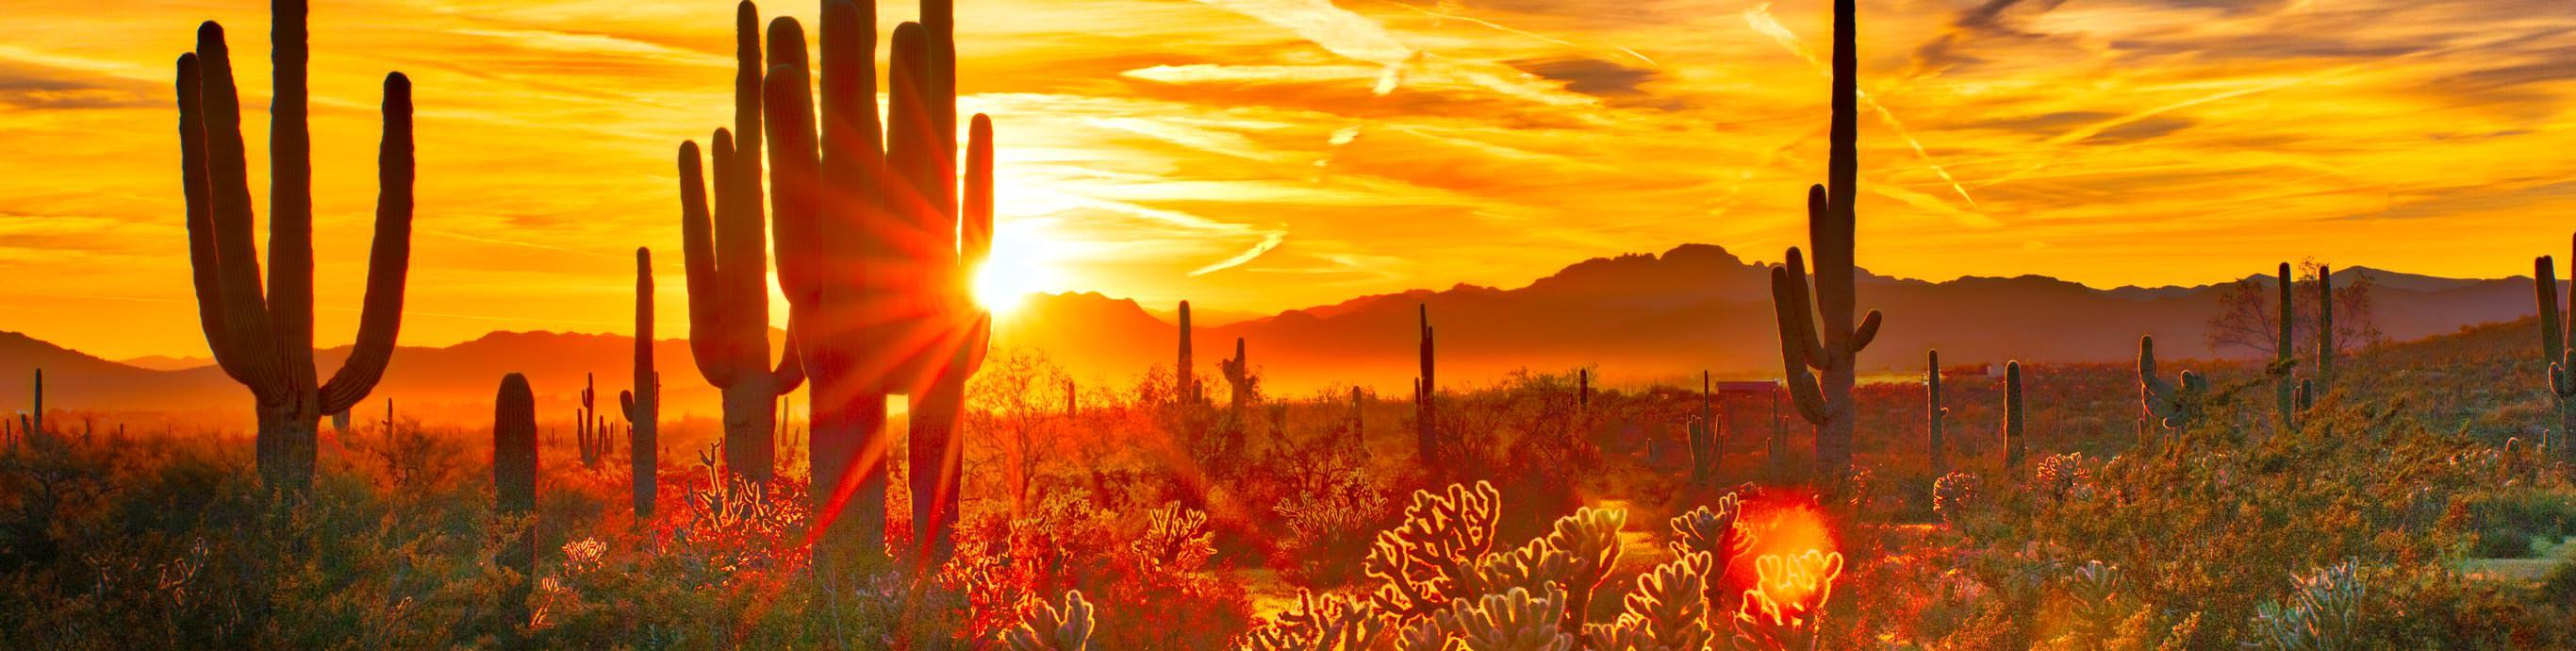 Arizona State Resources